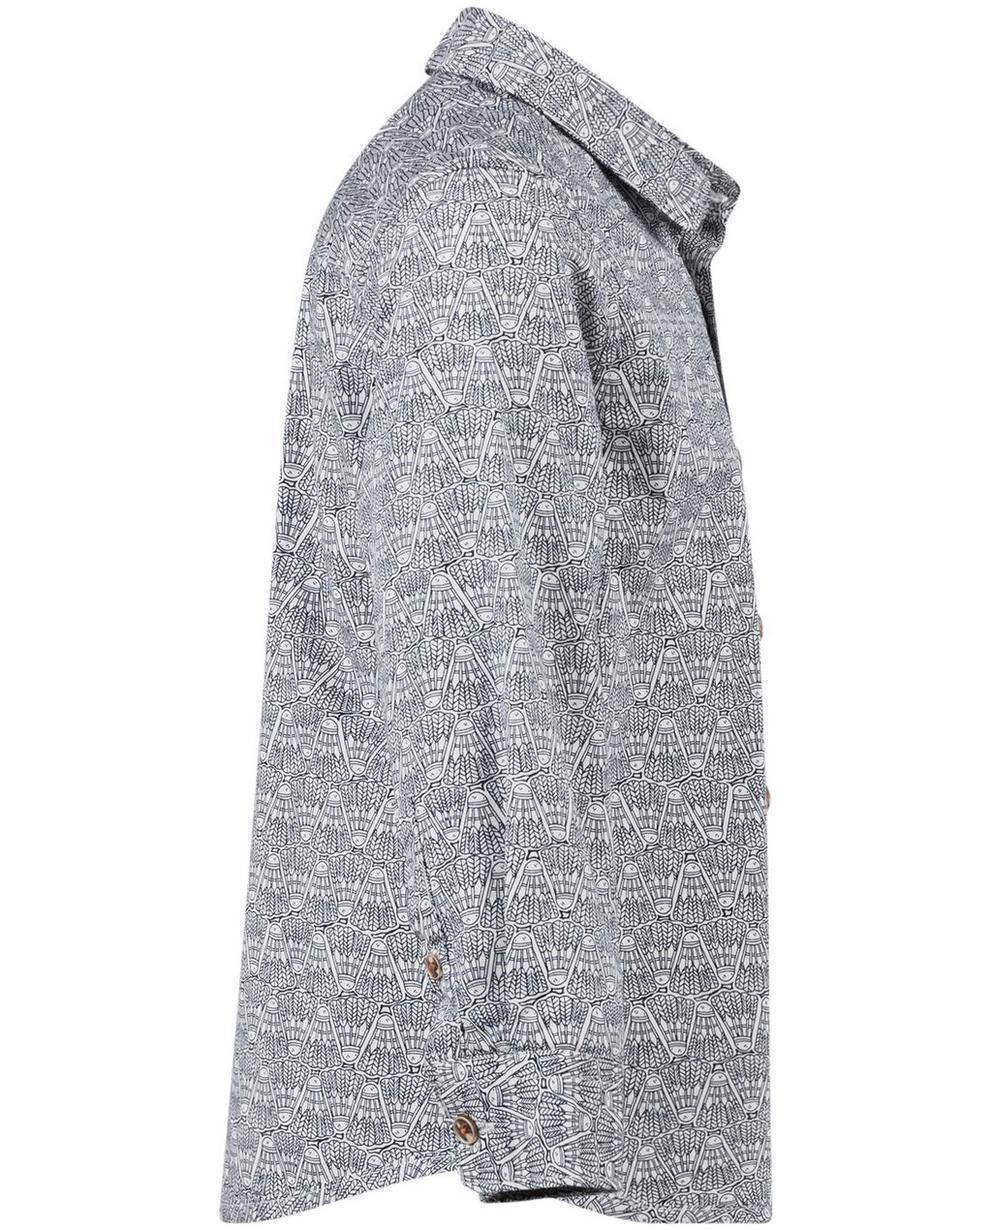 Hemden - Roomwit katoenen hemd